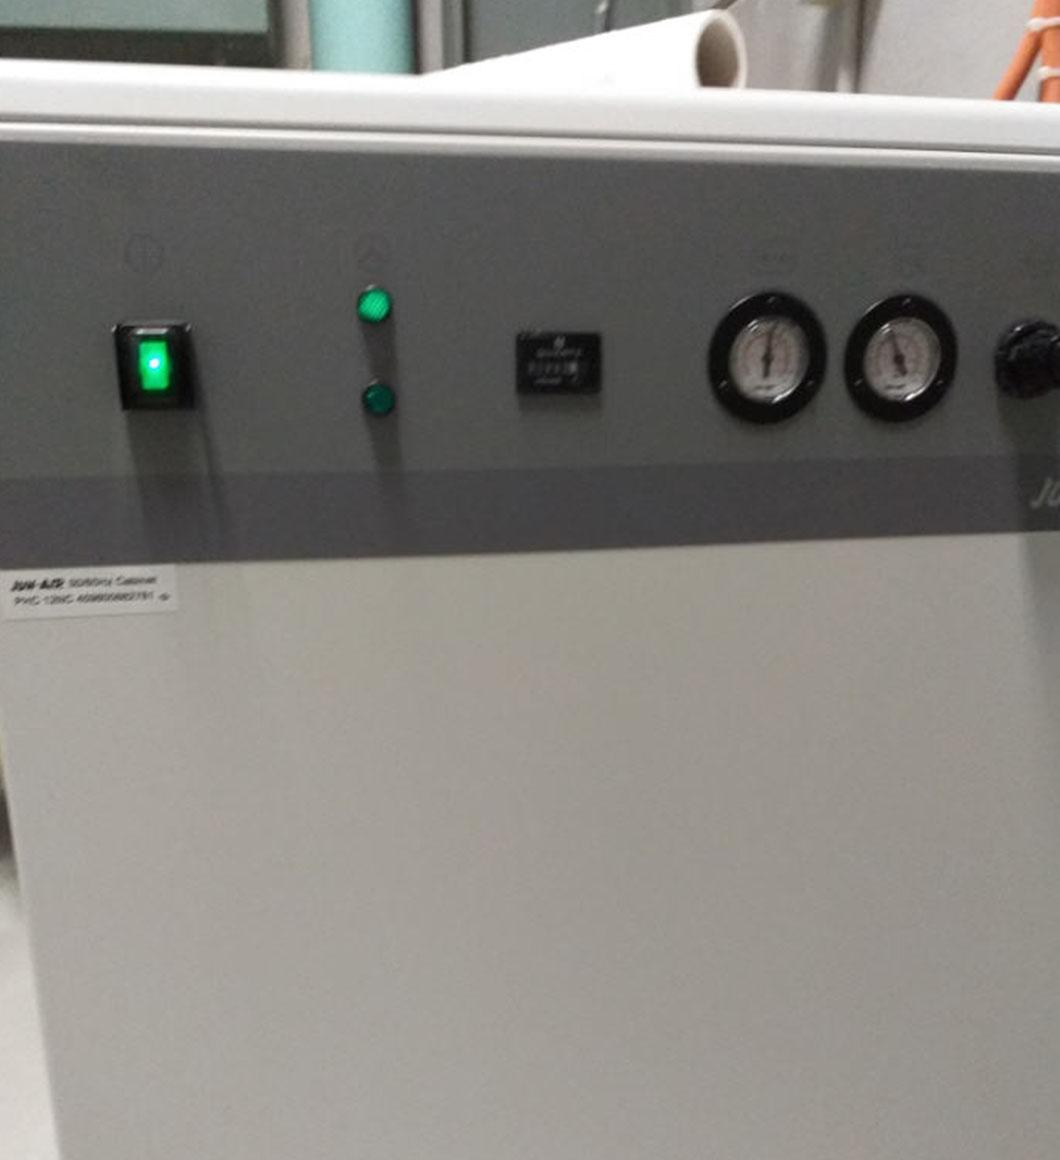 2010 Philips iCT SP 128